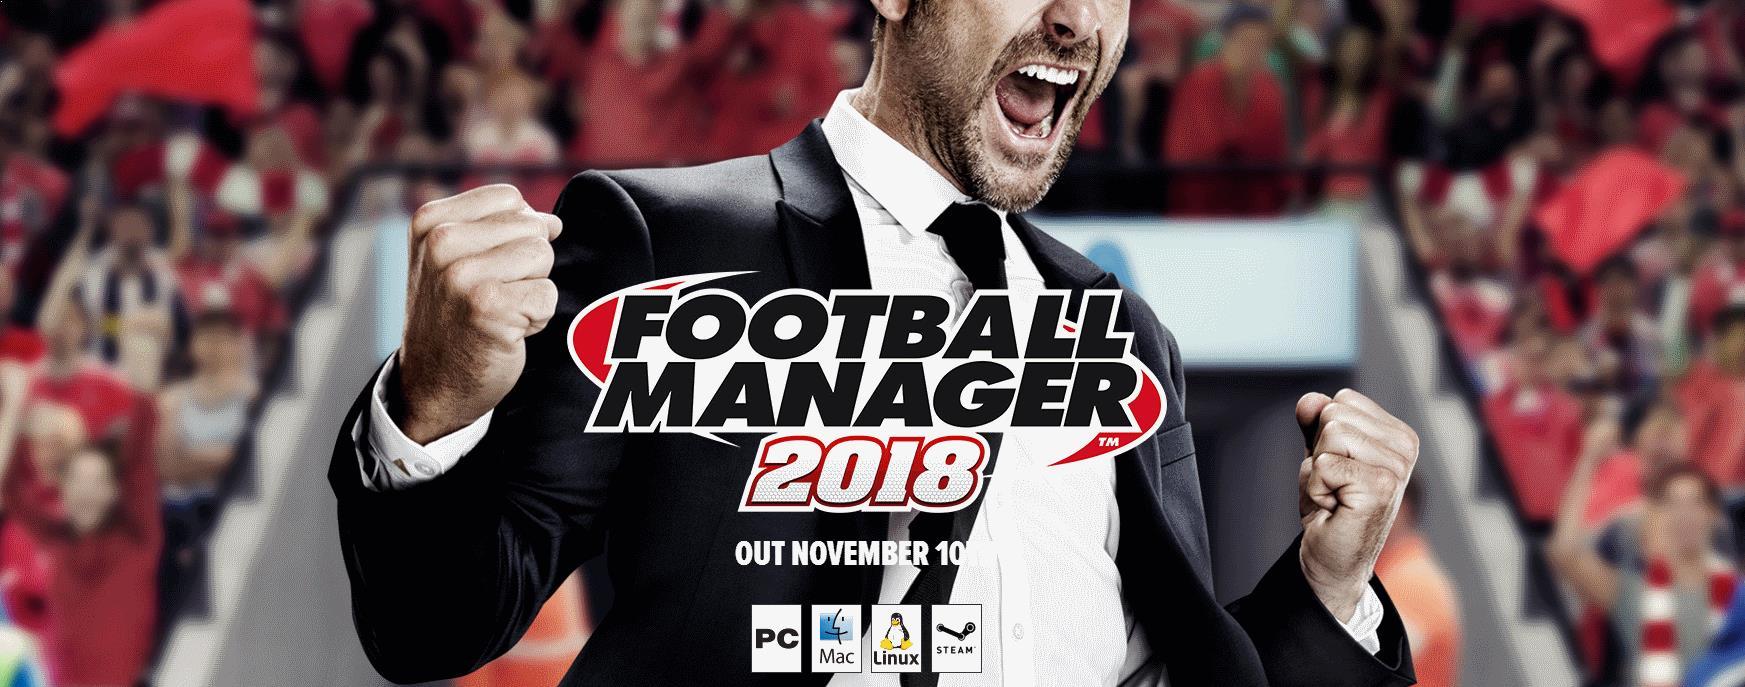 football_manager_2018_big